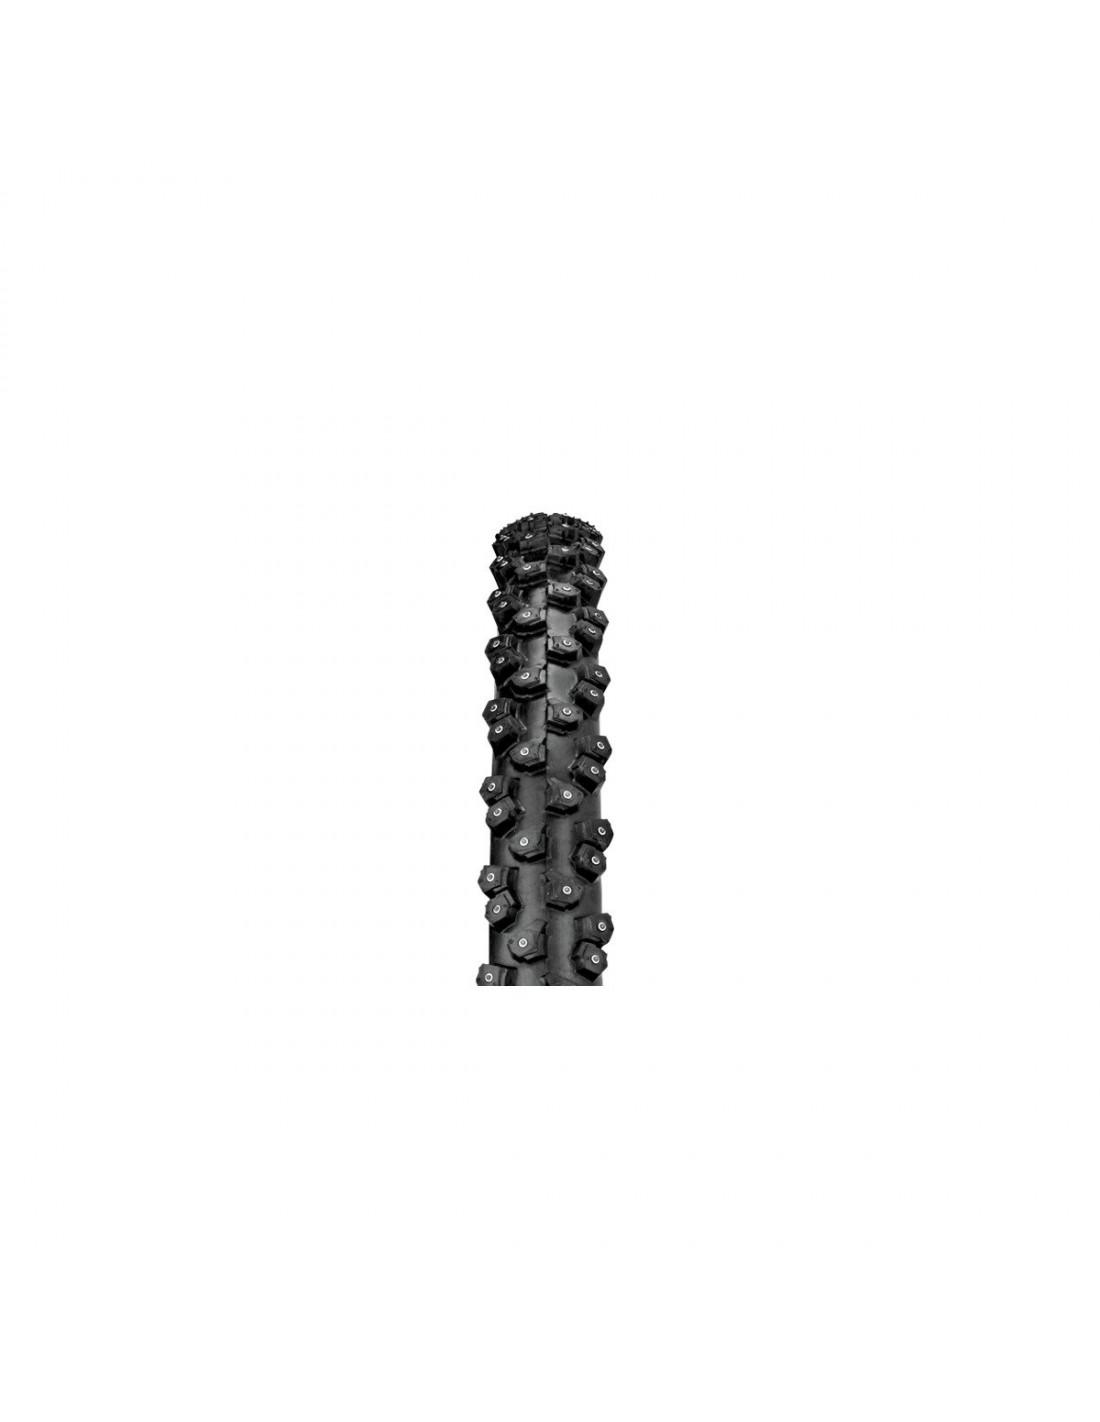 Dekk & Slange Soumi Tires Piggdekk Extreme 294 pigger 29x2,1 no200881  849 kr